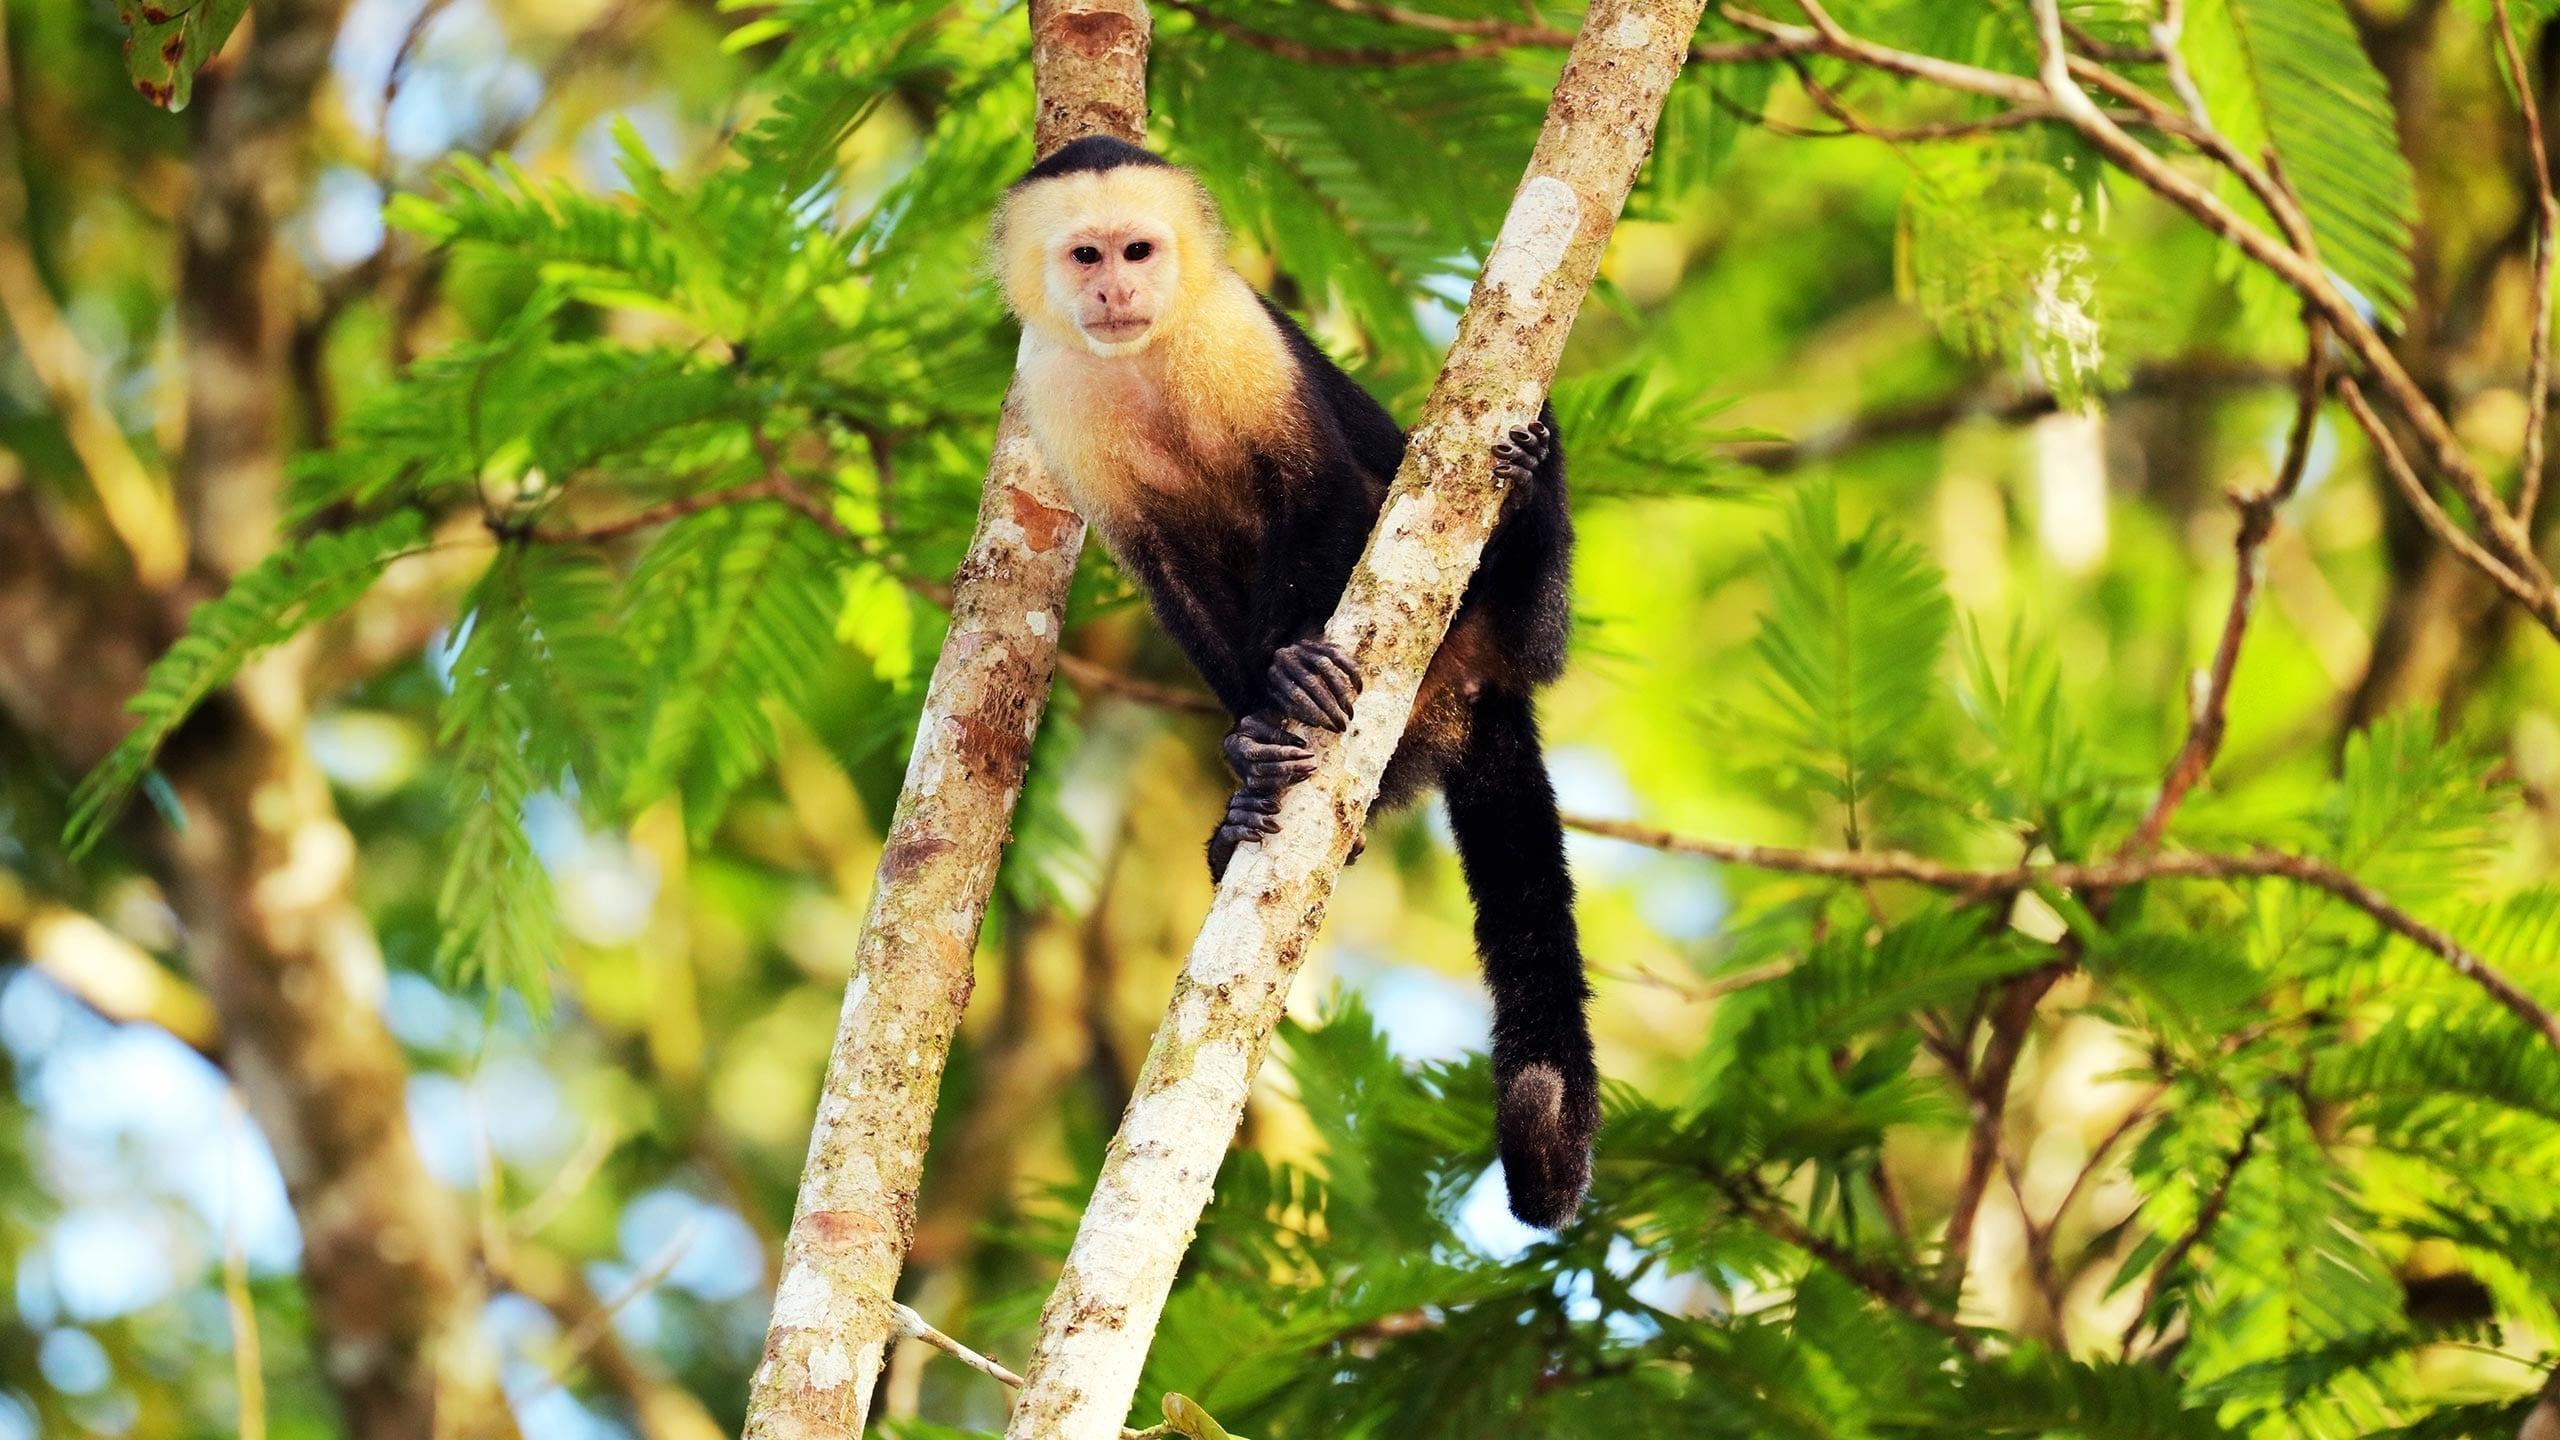 White-headed Capuchin (Cebus capucinus) is climbing in a tree, Tortuguero National Park, Costa Rica